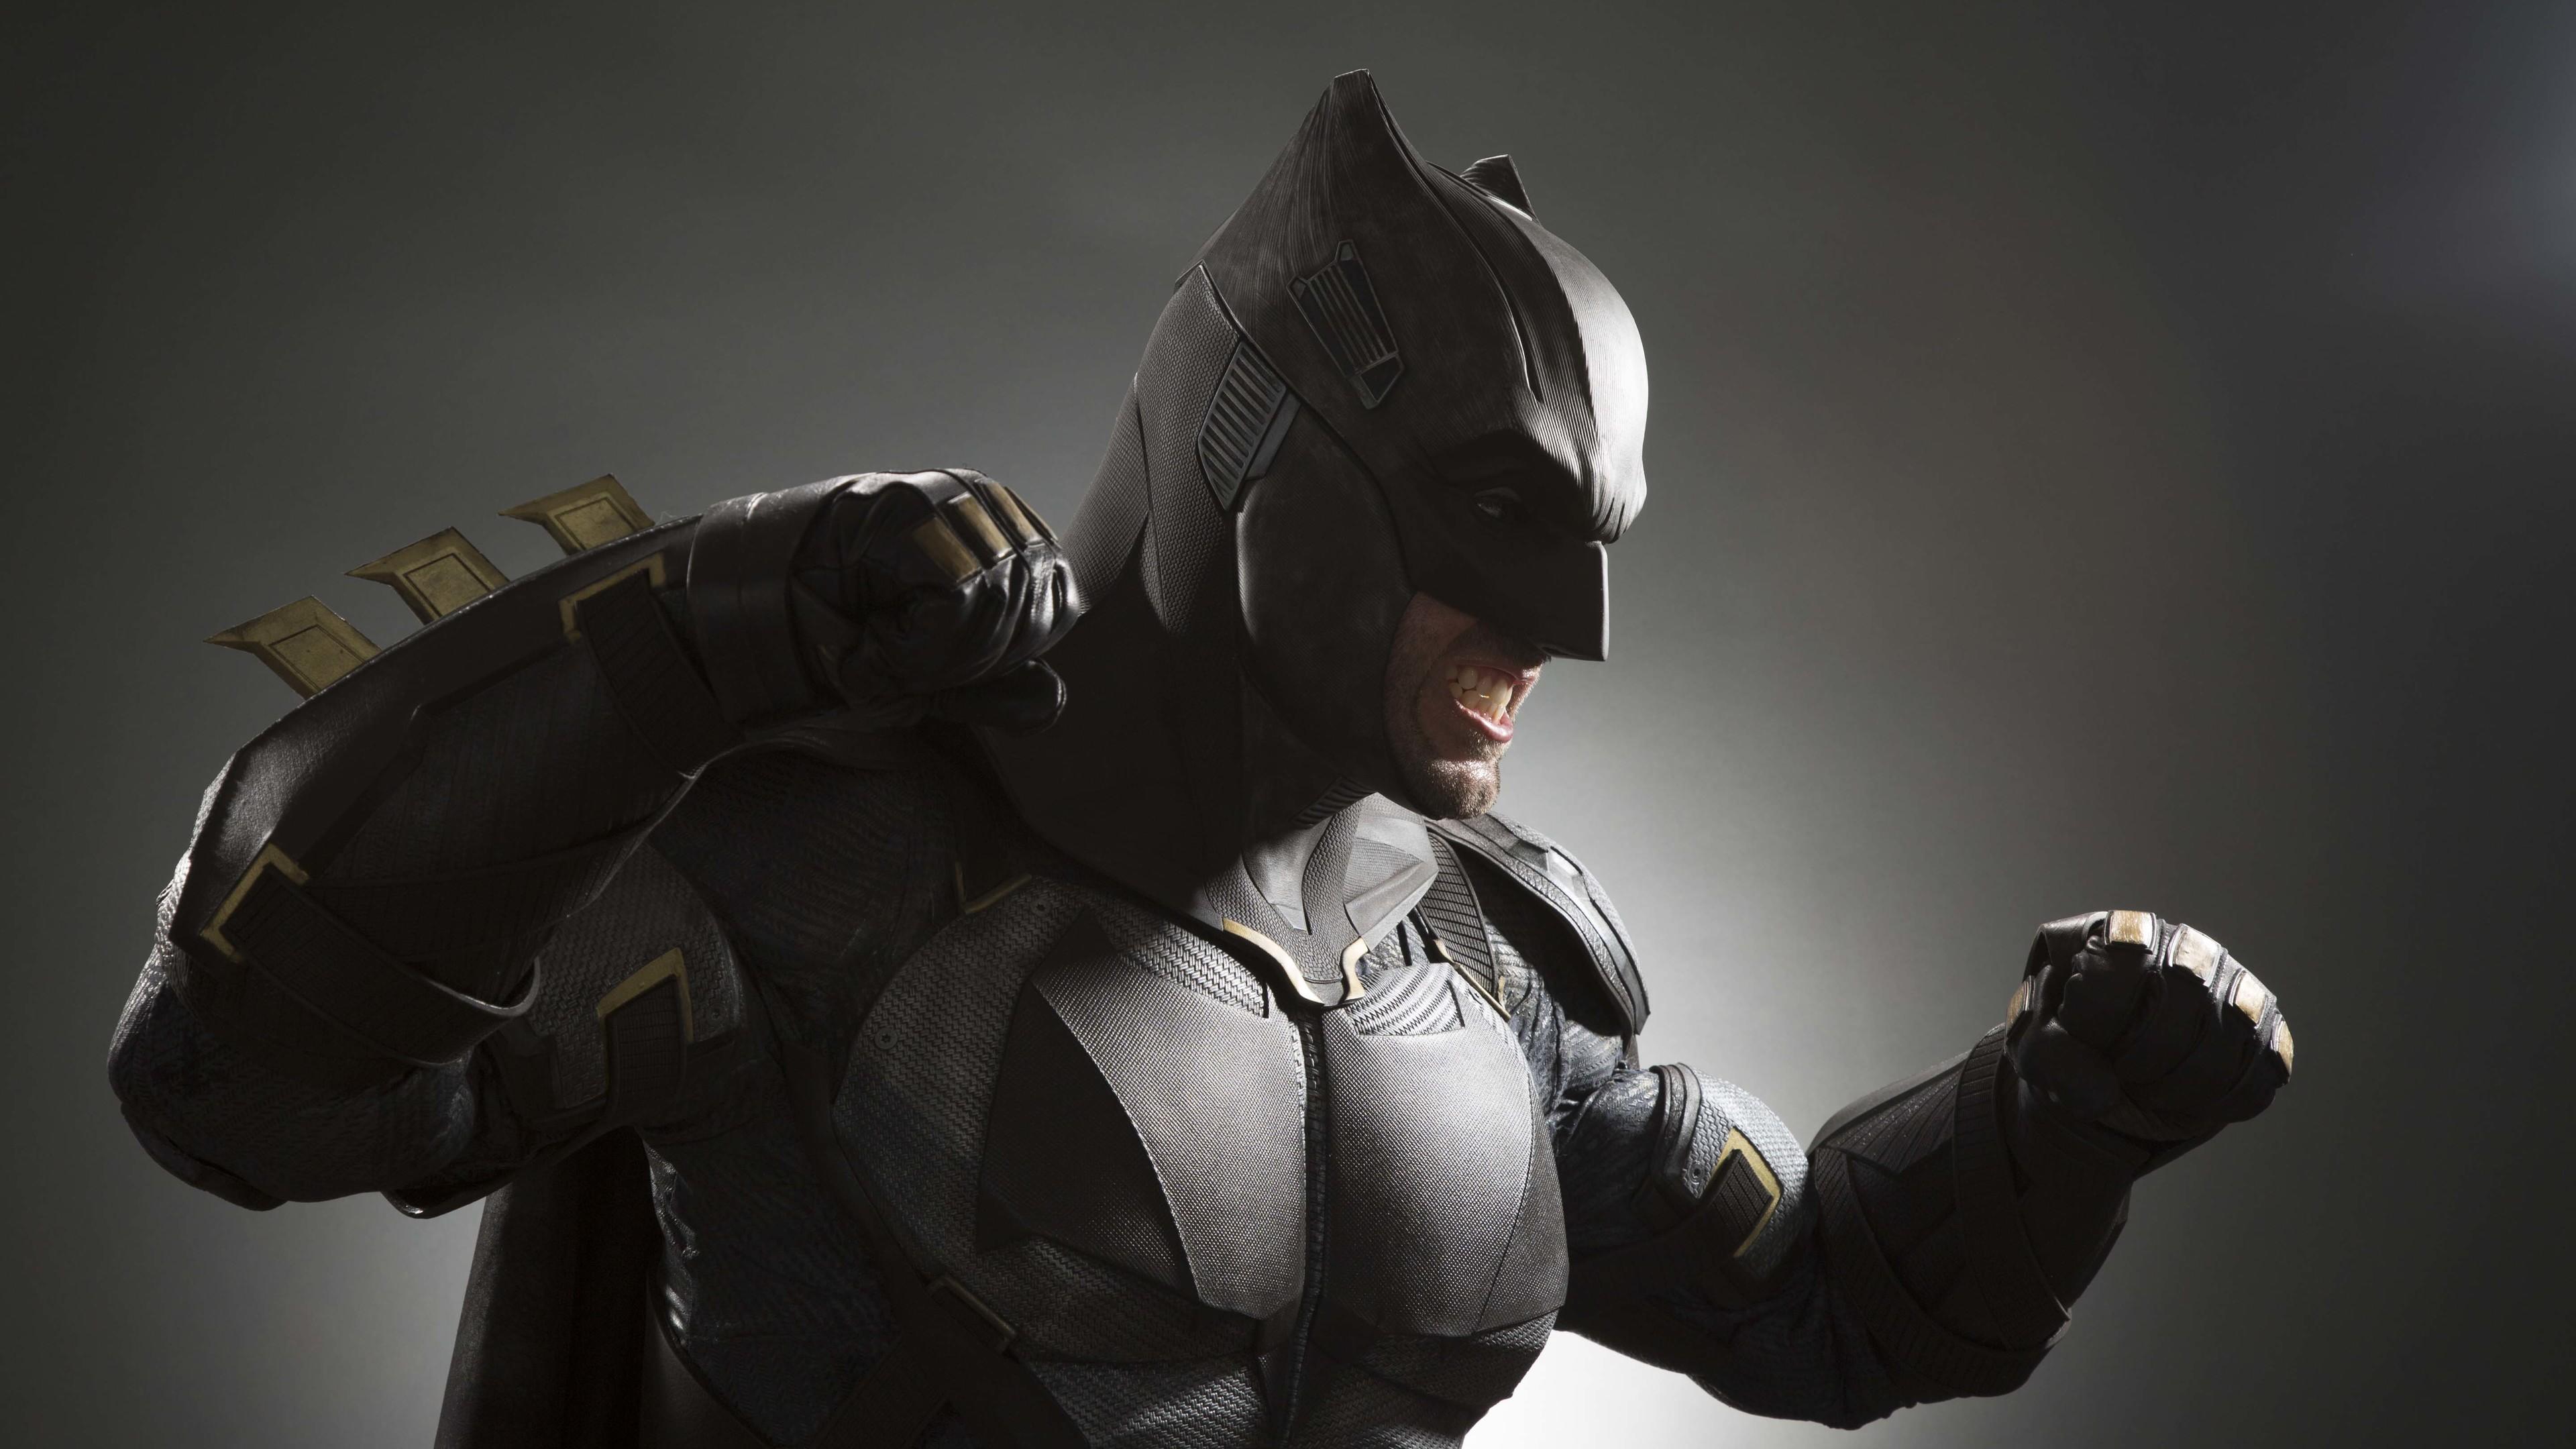 batman cosplay 4k 1543620057 - Batman Cosplay 4k - superheroes wallpapers, hd-wallpapers, cosplay wallpapers, batman wallpapers, 4k-wallpapers